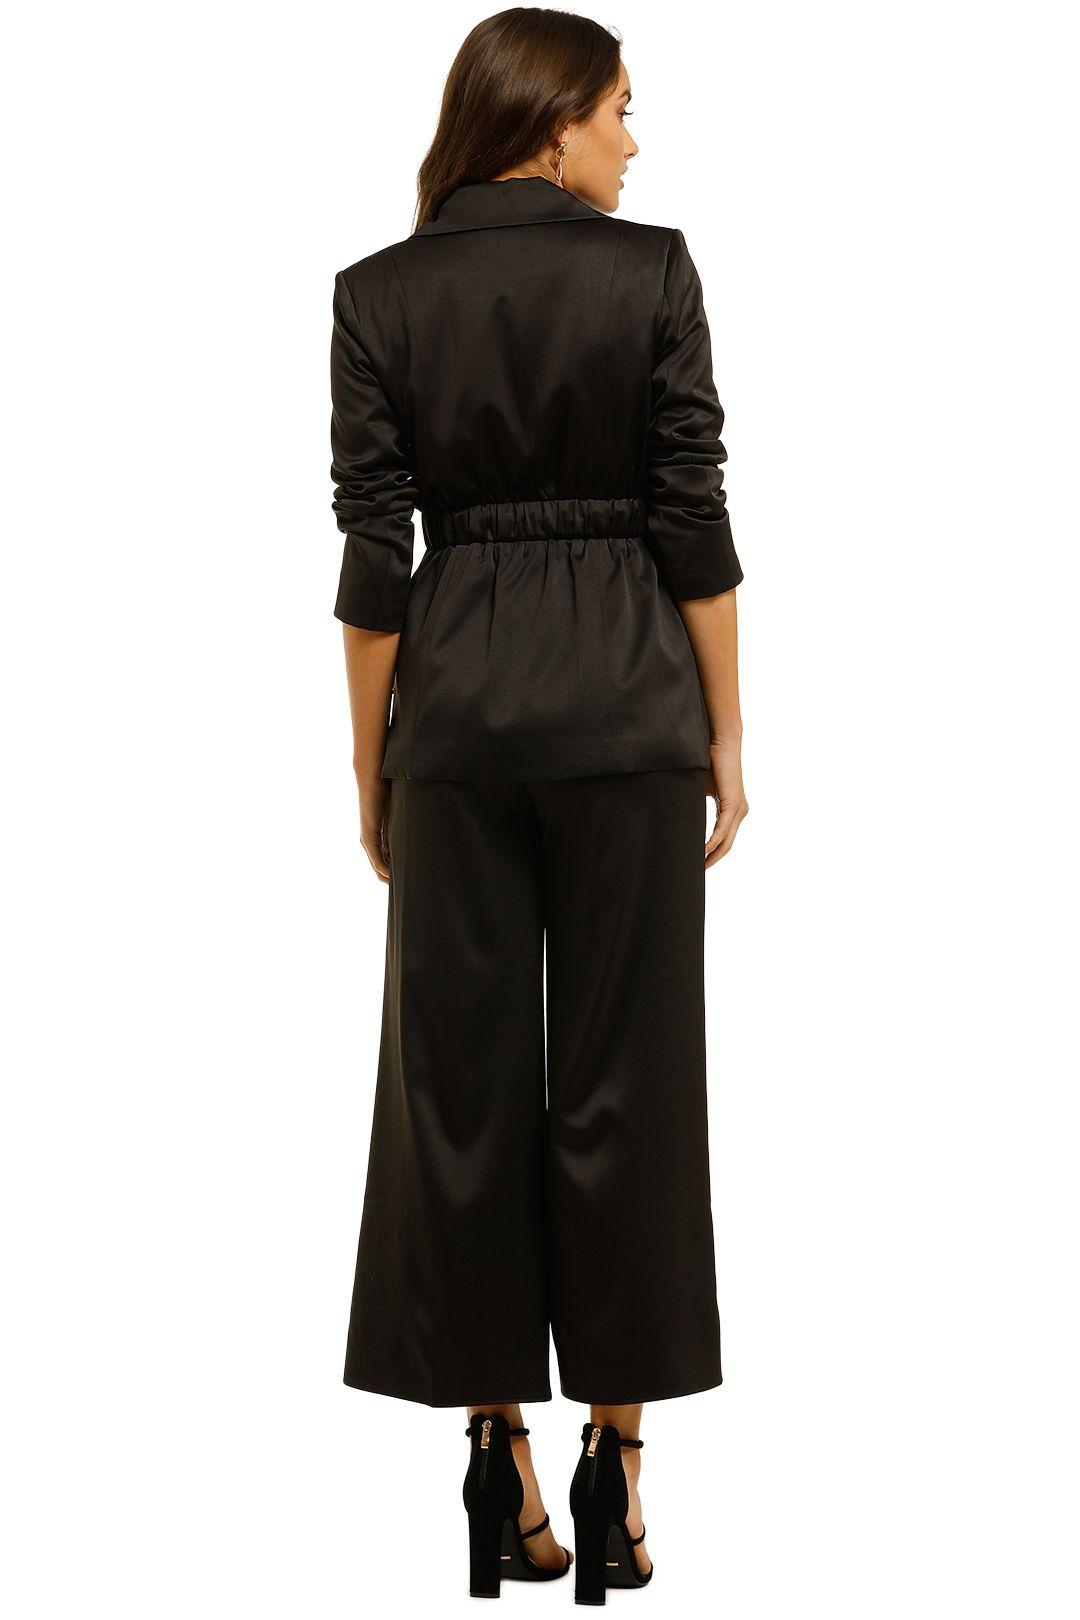 Elliatt-Shimmer-Blazer-and-Pant-Set-Black-Back